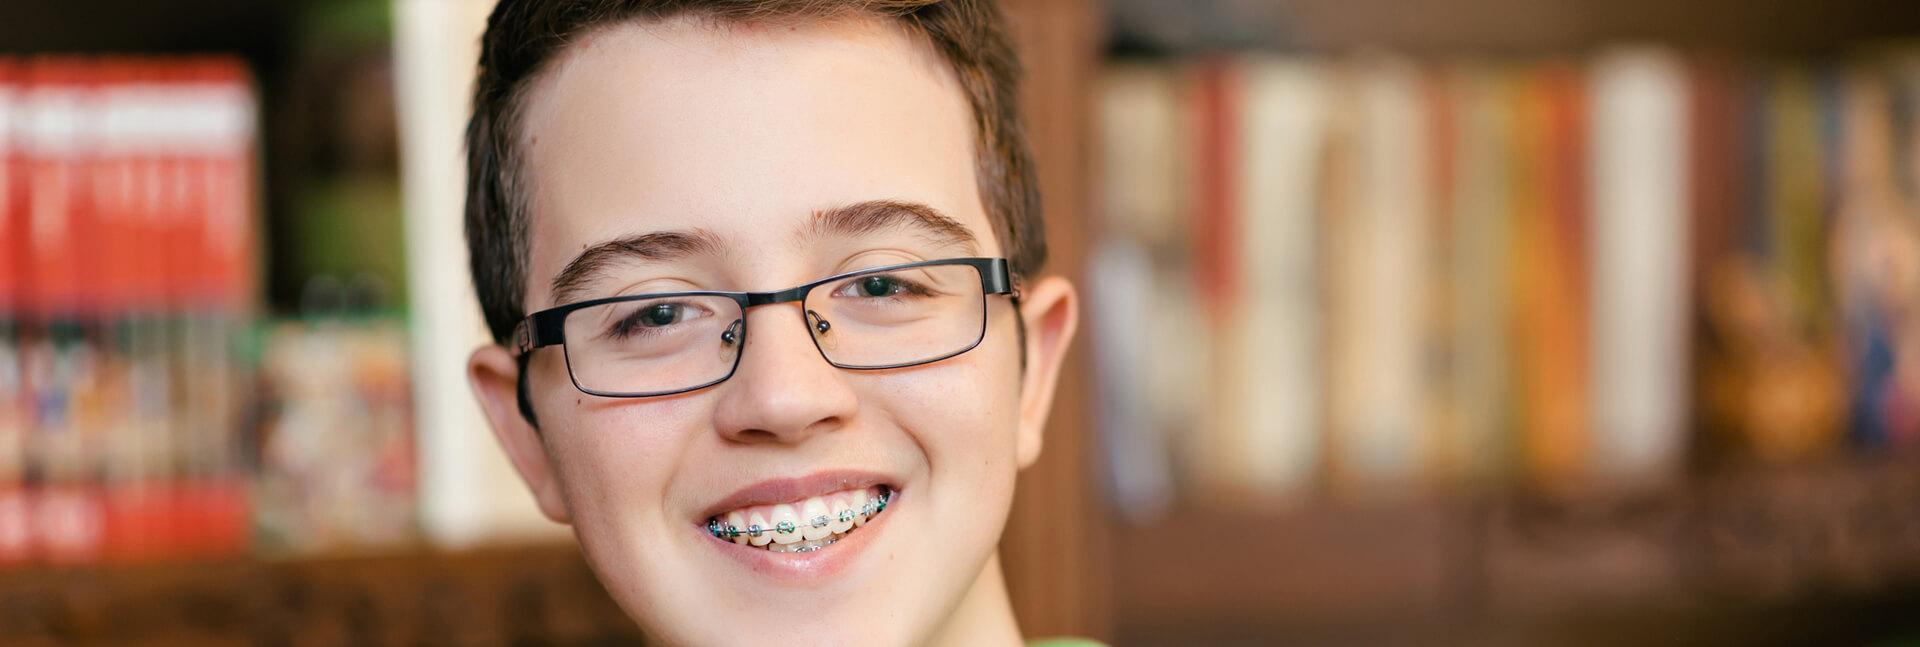 Childrens Orthodontics